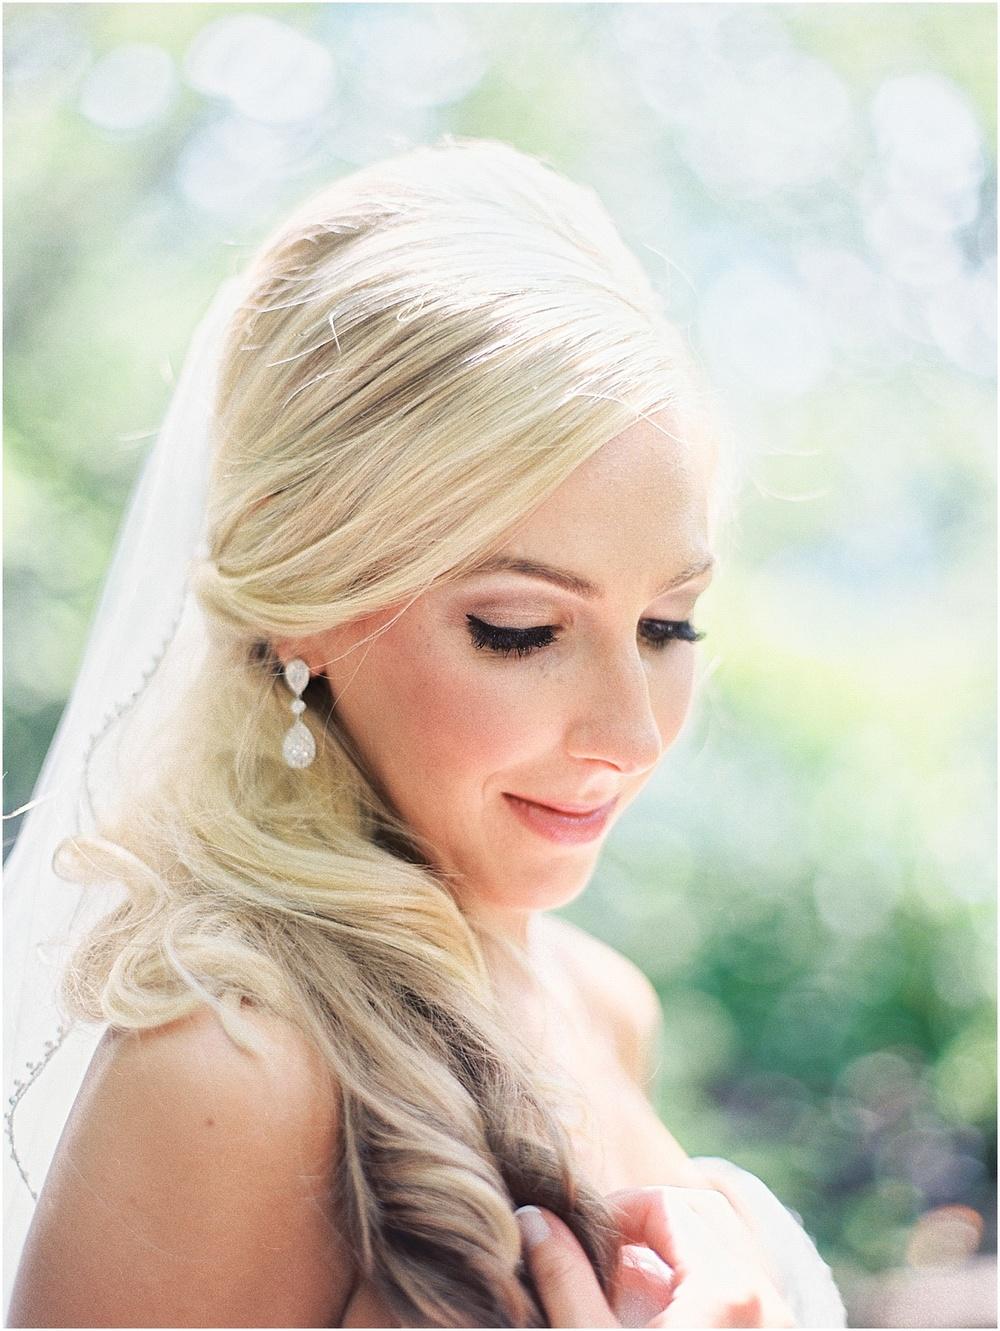 St_Louis_Wedding_Fine_Art_Film_Photographer_Jordan_Brittley_(www.jordanbrittley.com)_0008.jpg